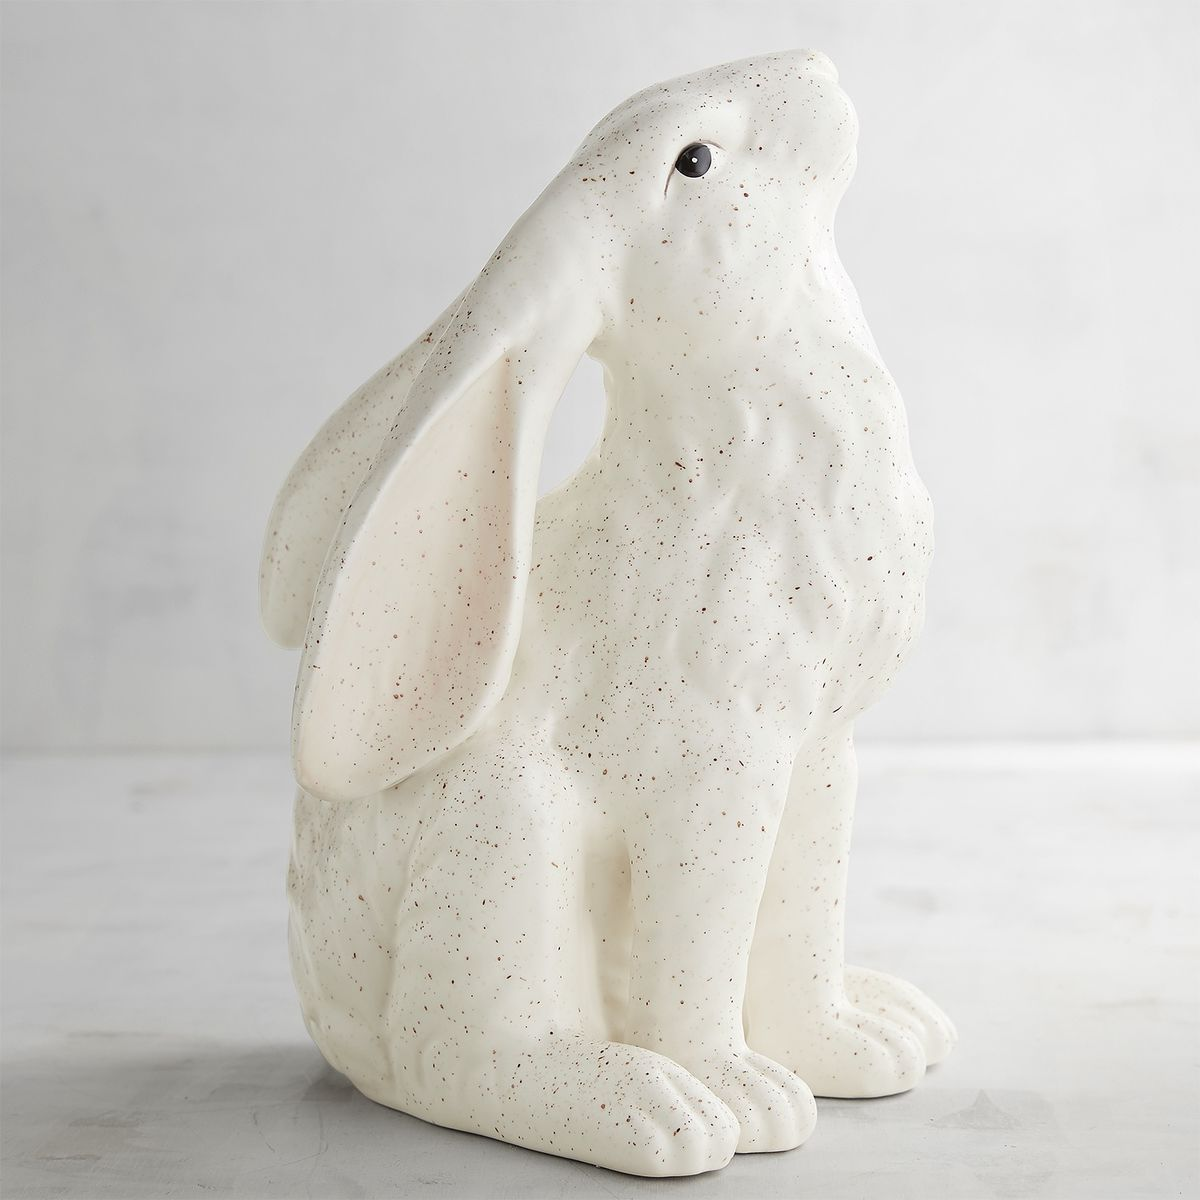 Speckled Ceramic Rabbit   Pier 1 Imports